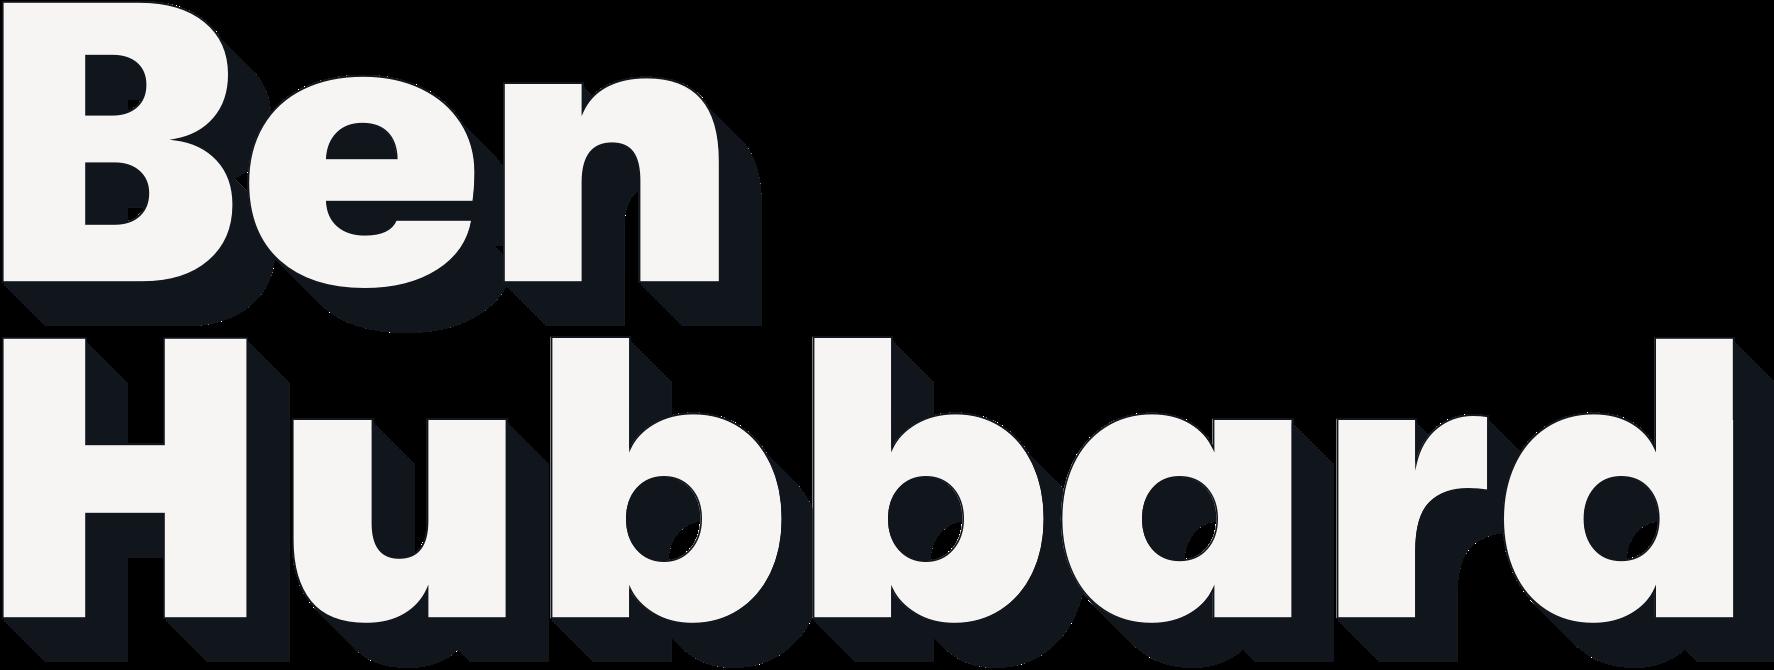 Ben Hubbard logo